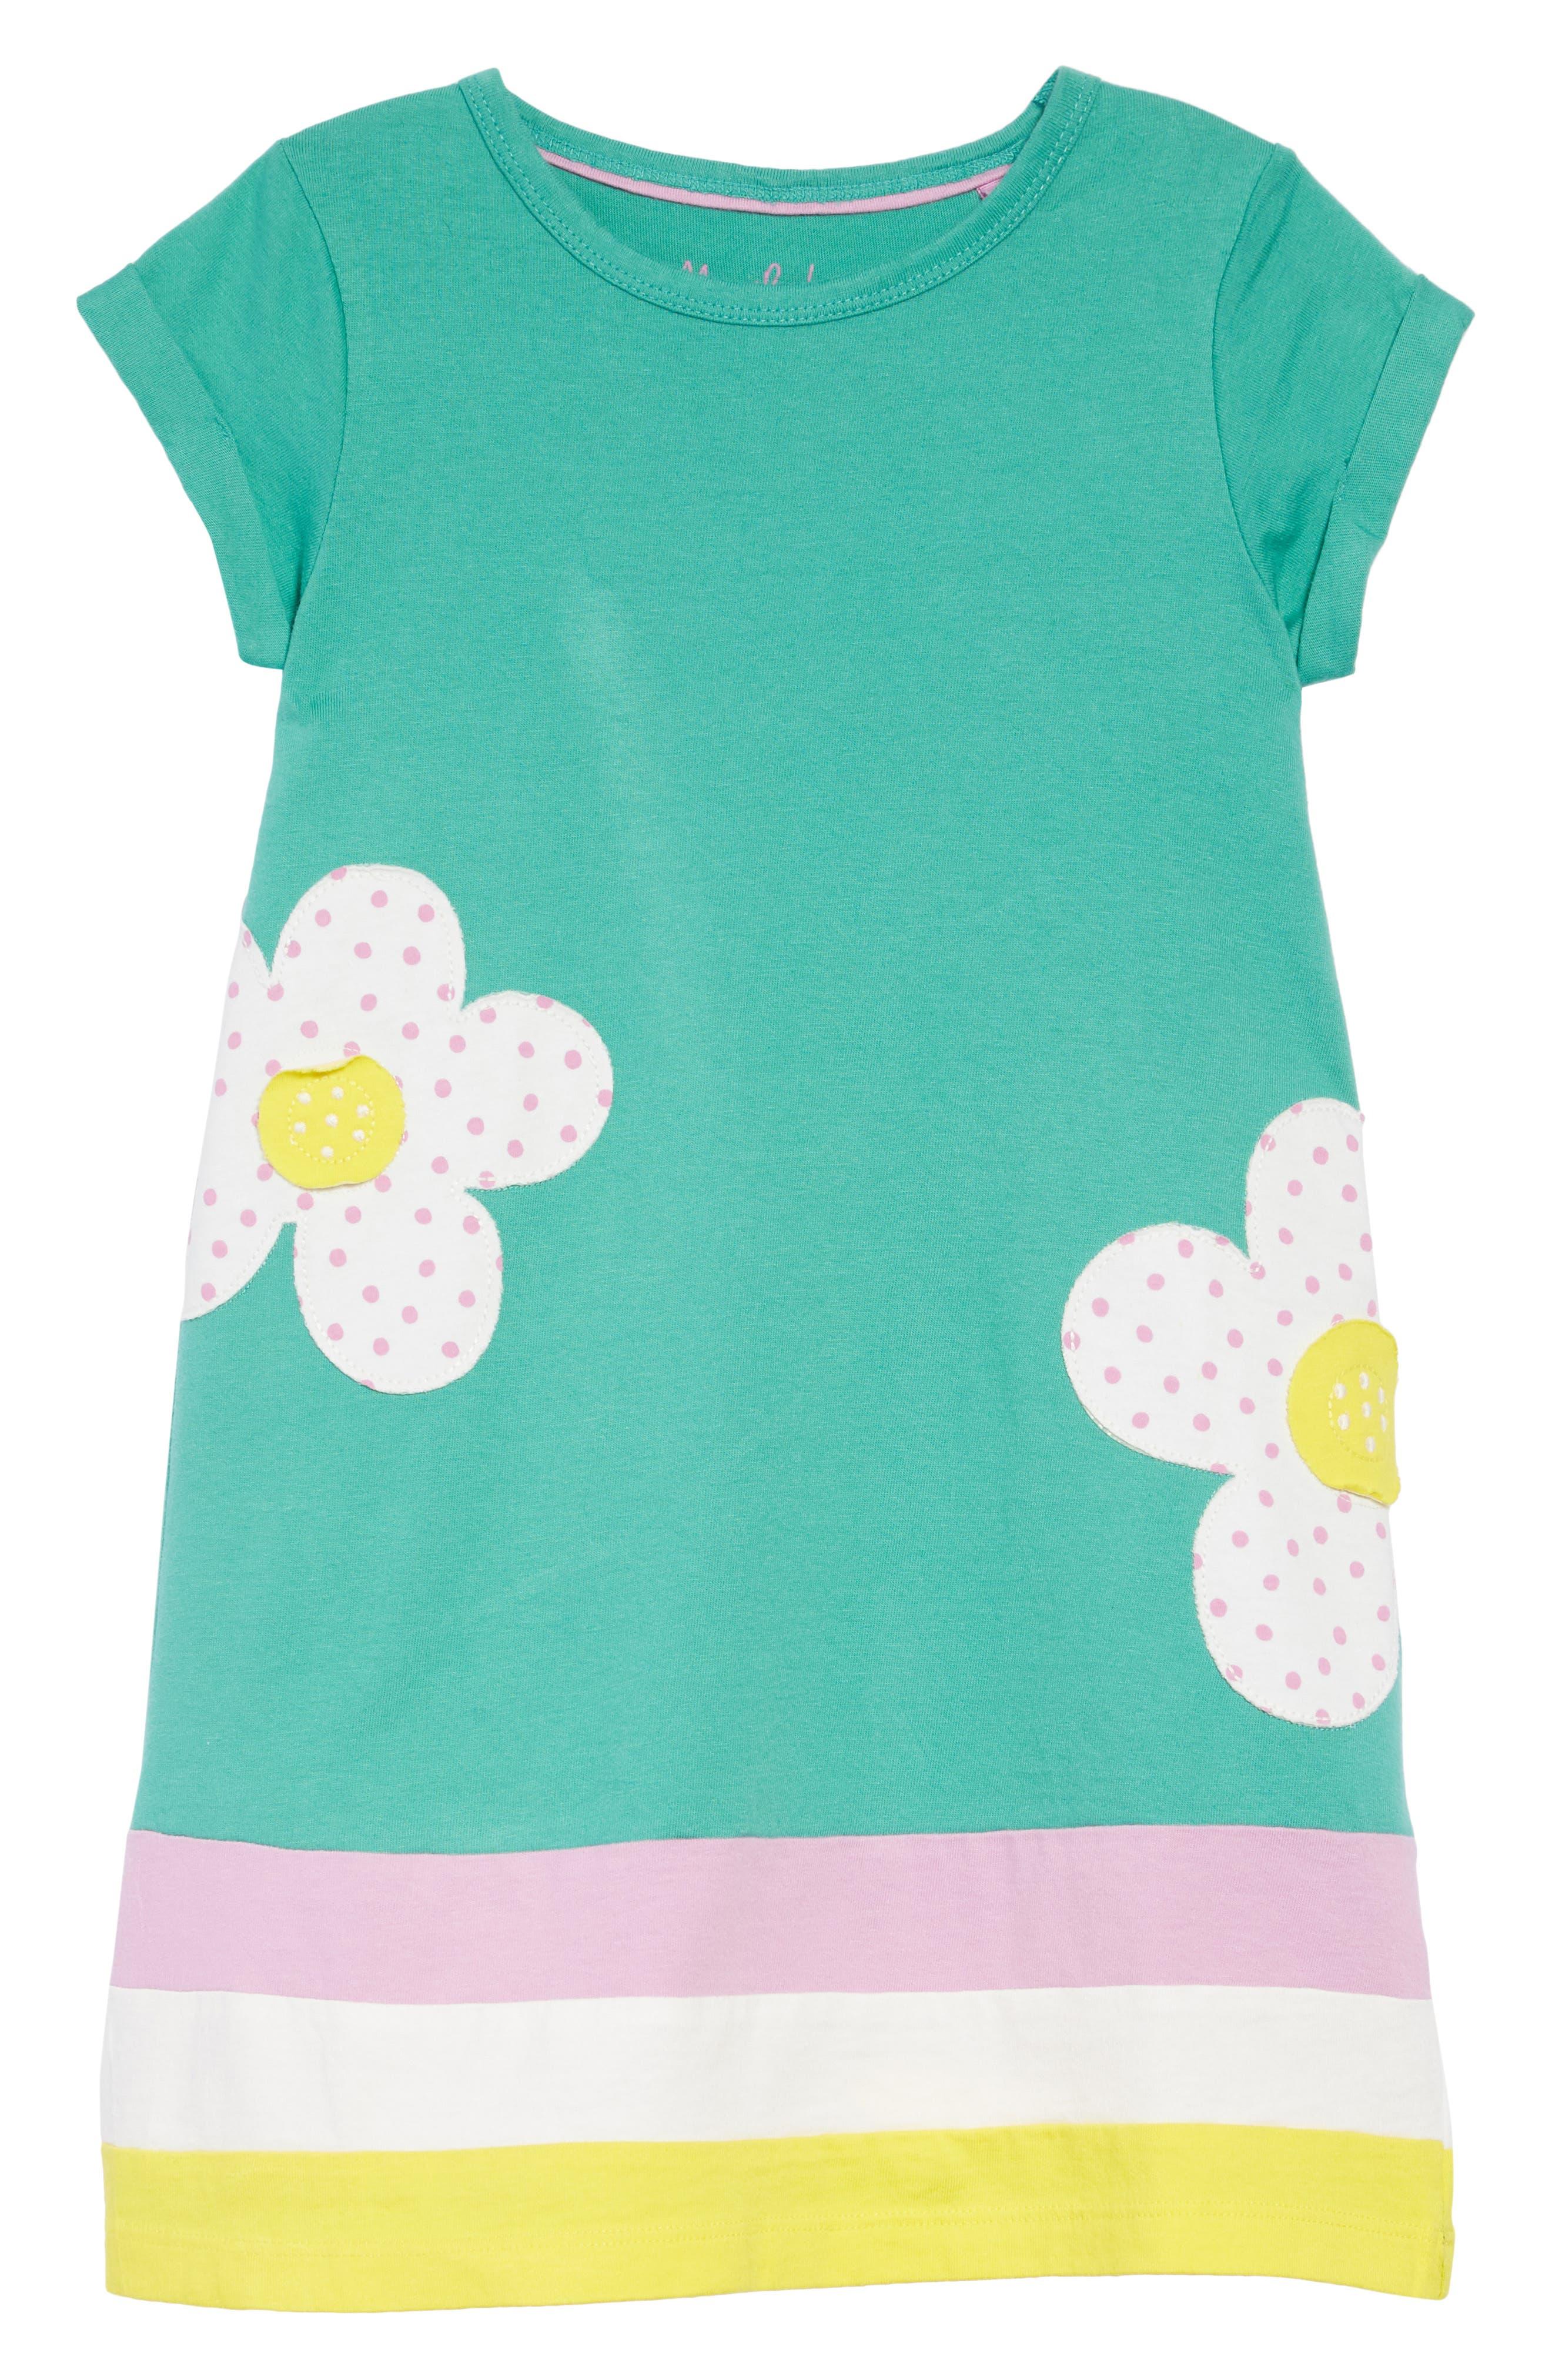 87738107bca7 Mini Boden Girls  Clothing